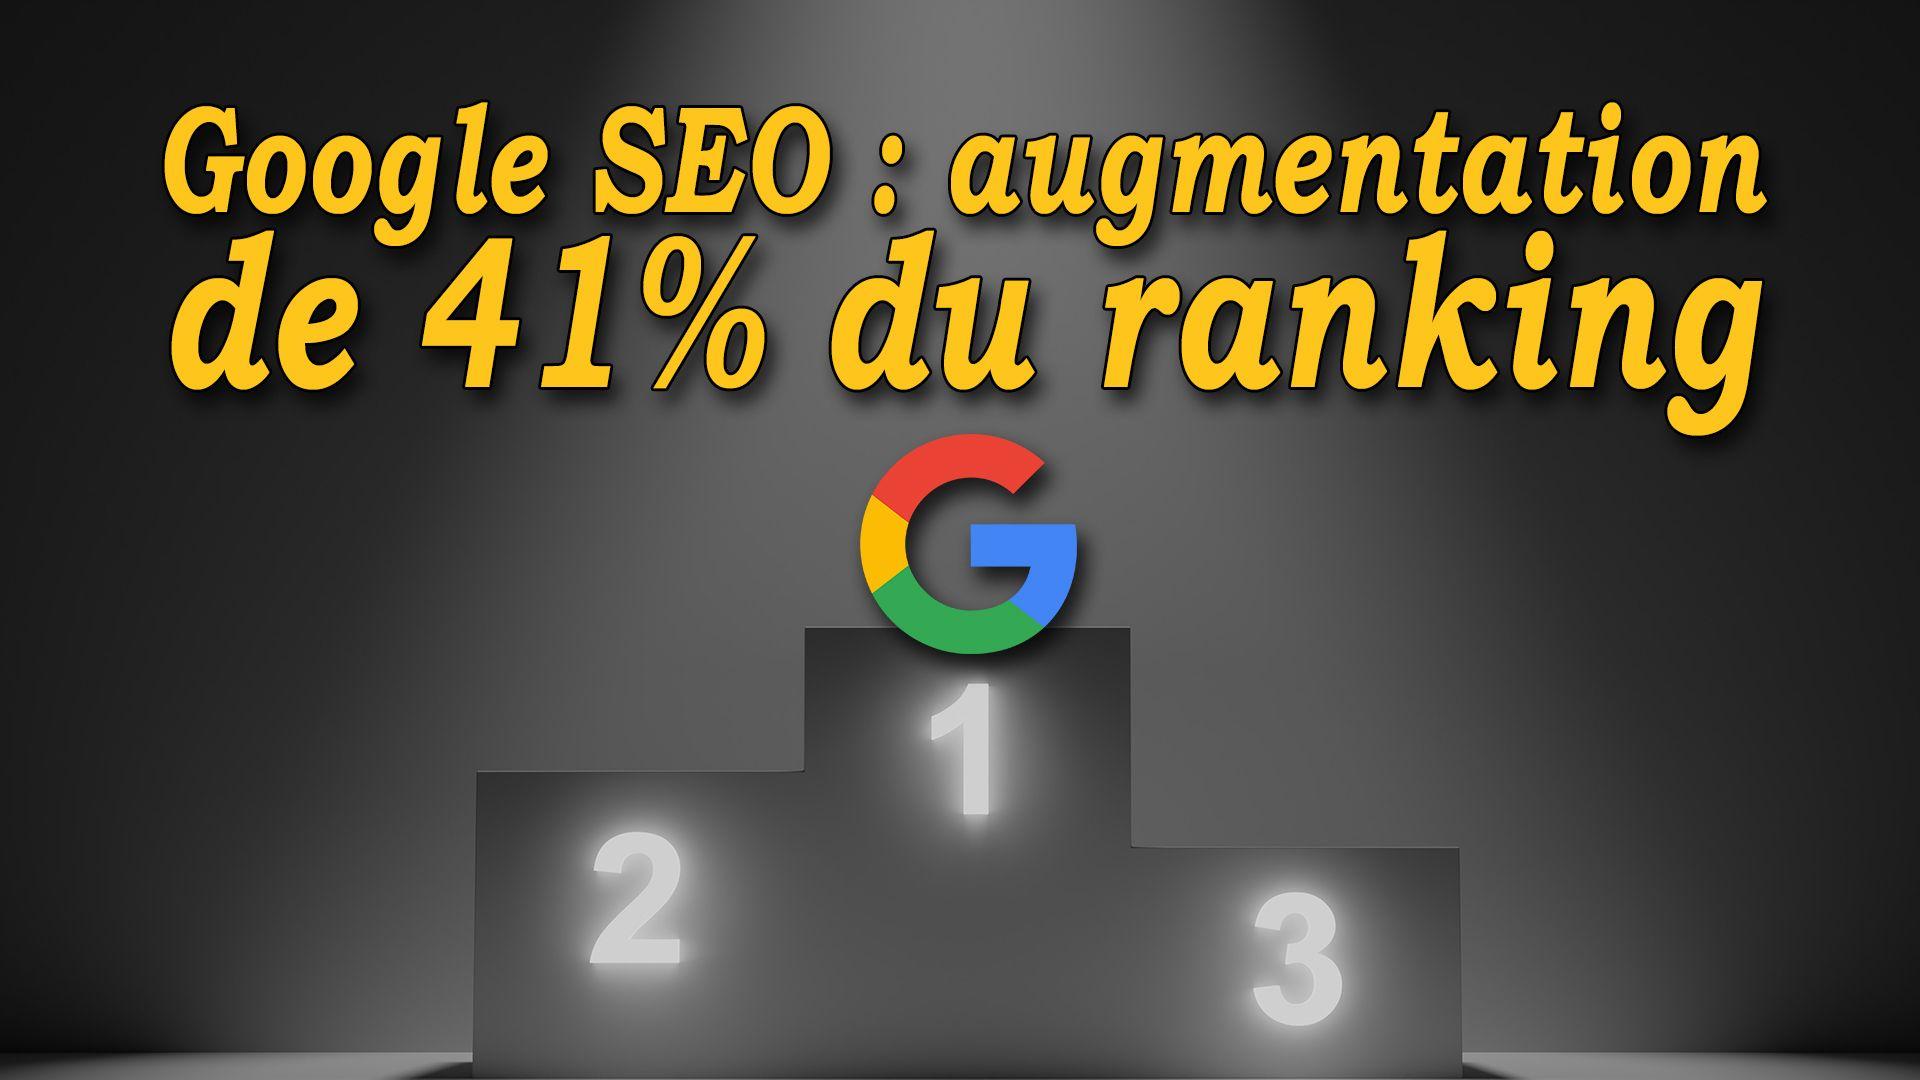 Google SEO : augmentation de 41% du ranking #GrowthHacking #WebMarketing #FormationGrowthHacking #CentreDeFormationFrance #TunnelAARRR #AARRR #SocialMedia #CommunityManagement #SEO